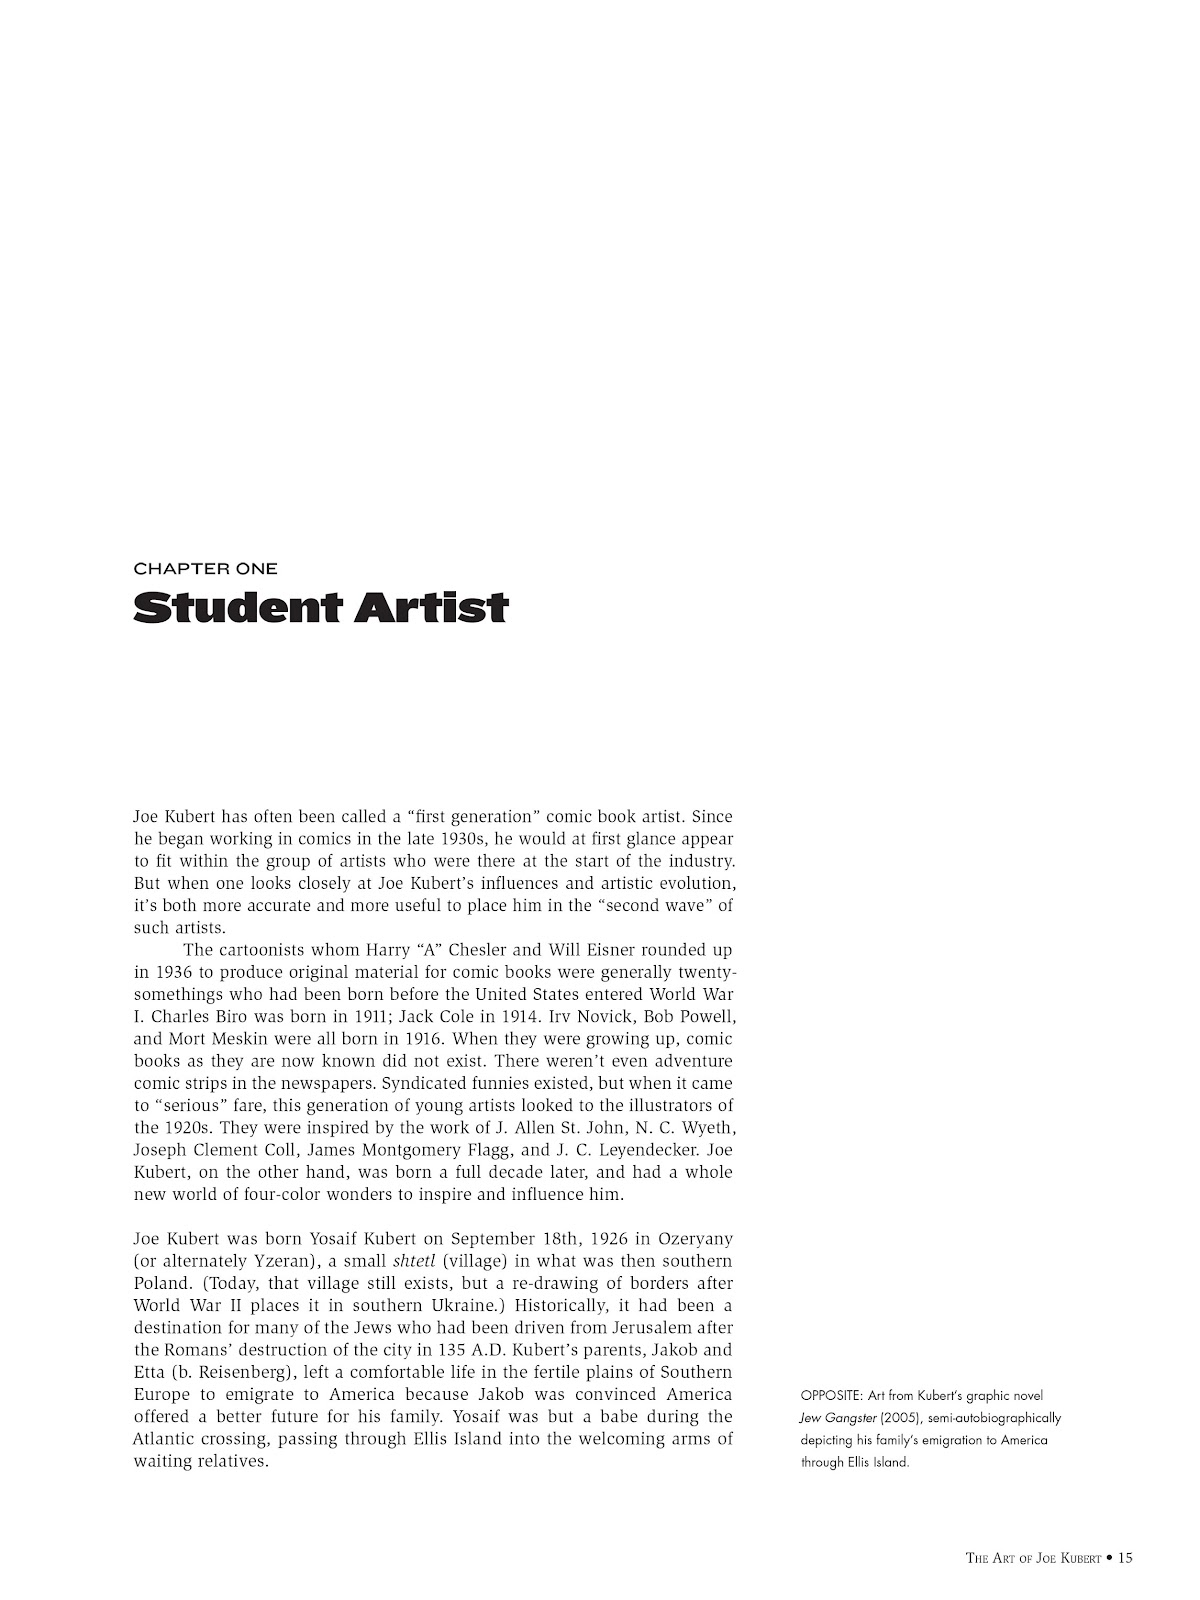 Read online The Art of Joe Kubert comic -  Issue # TPB (Part 1) - 15